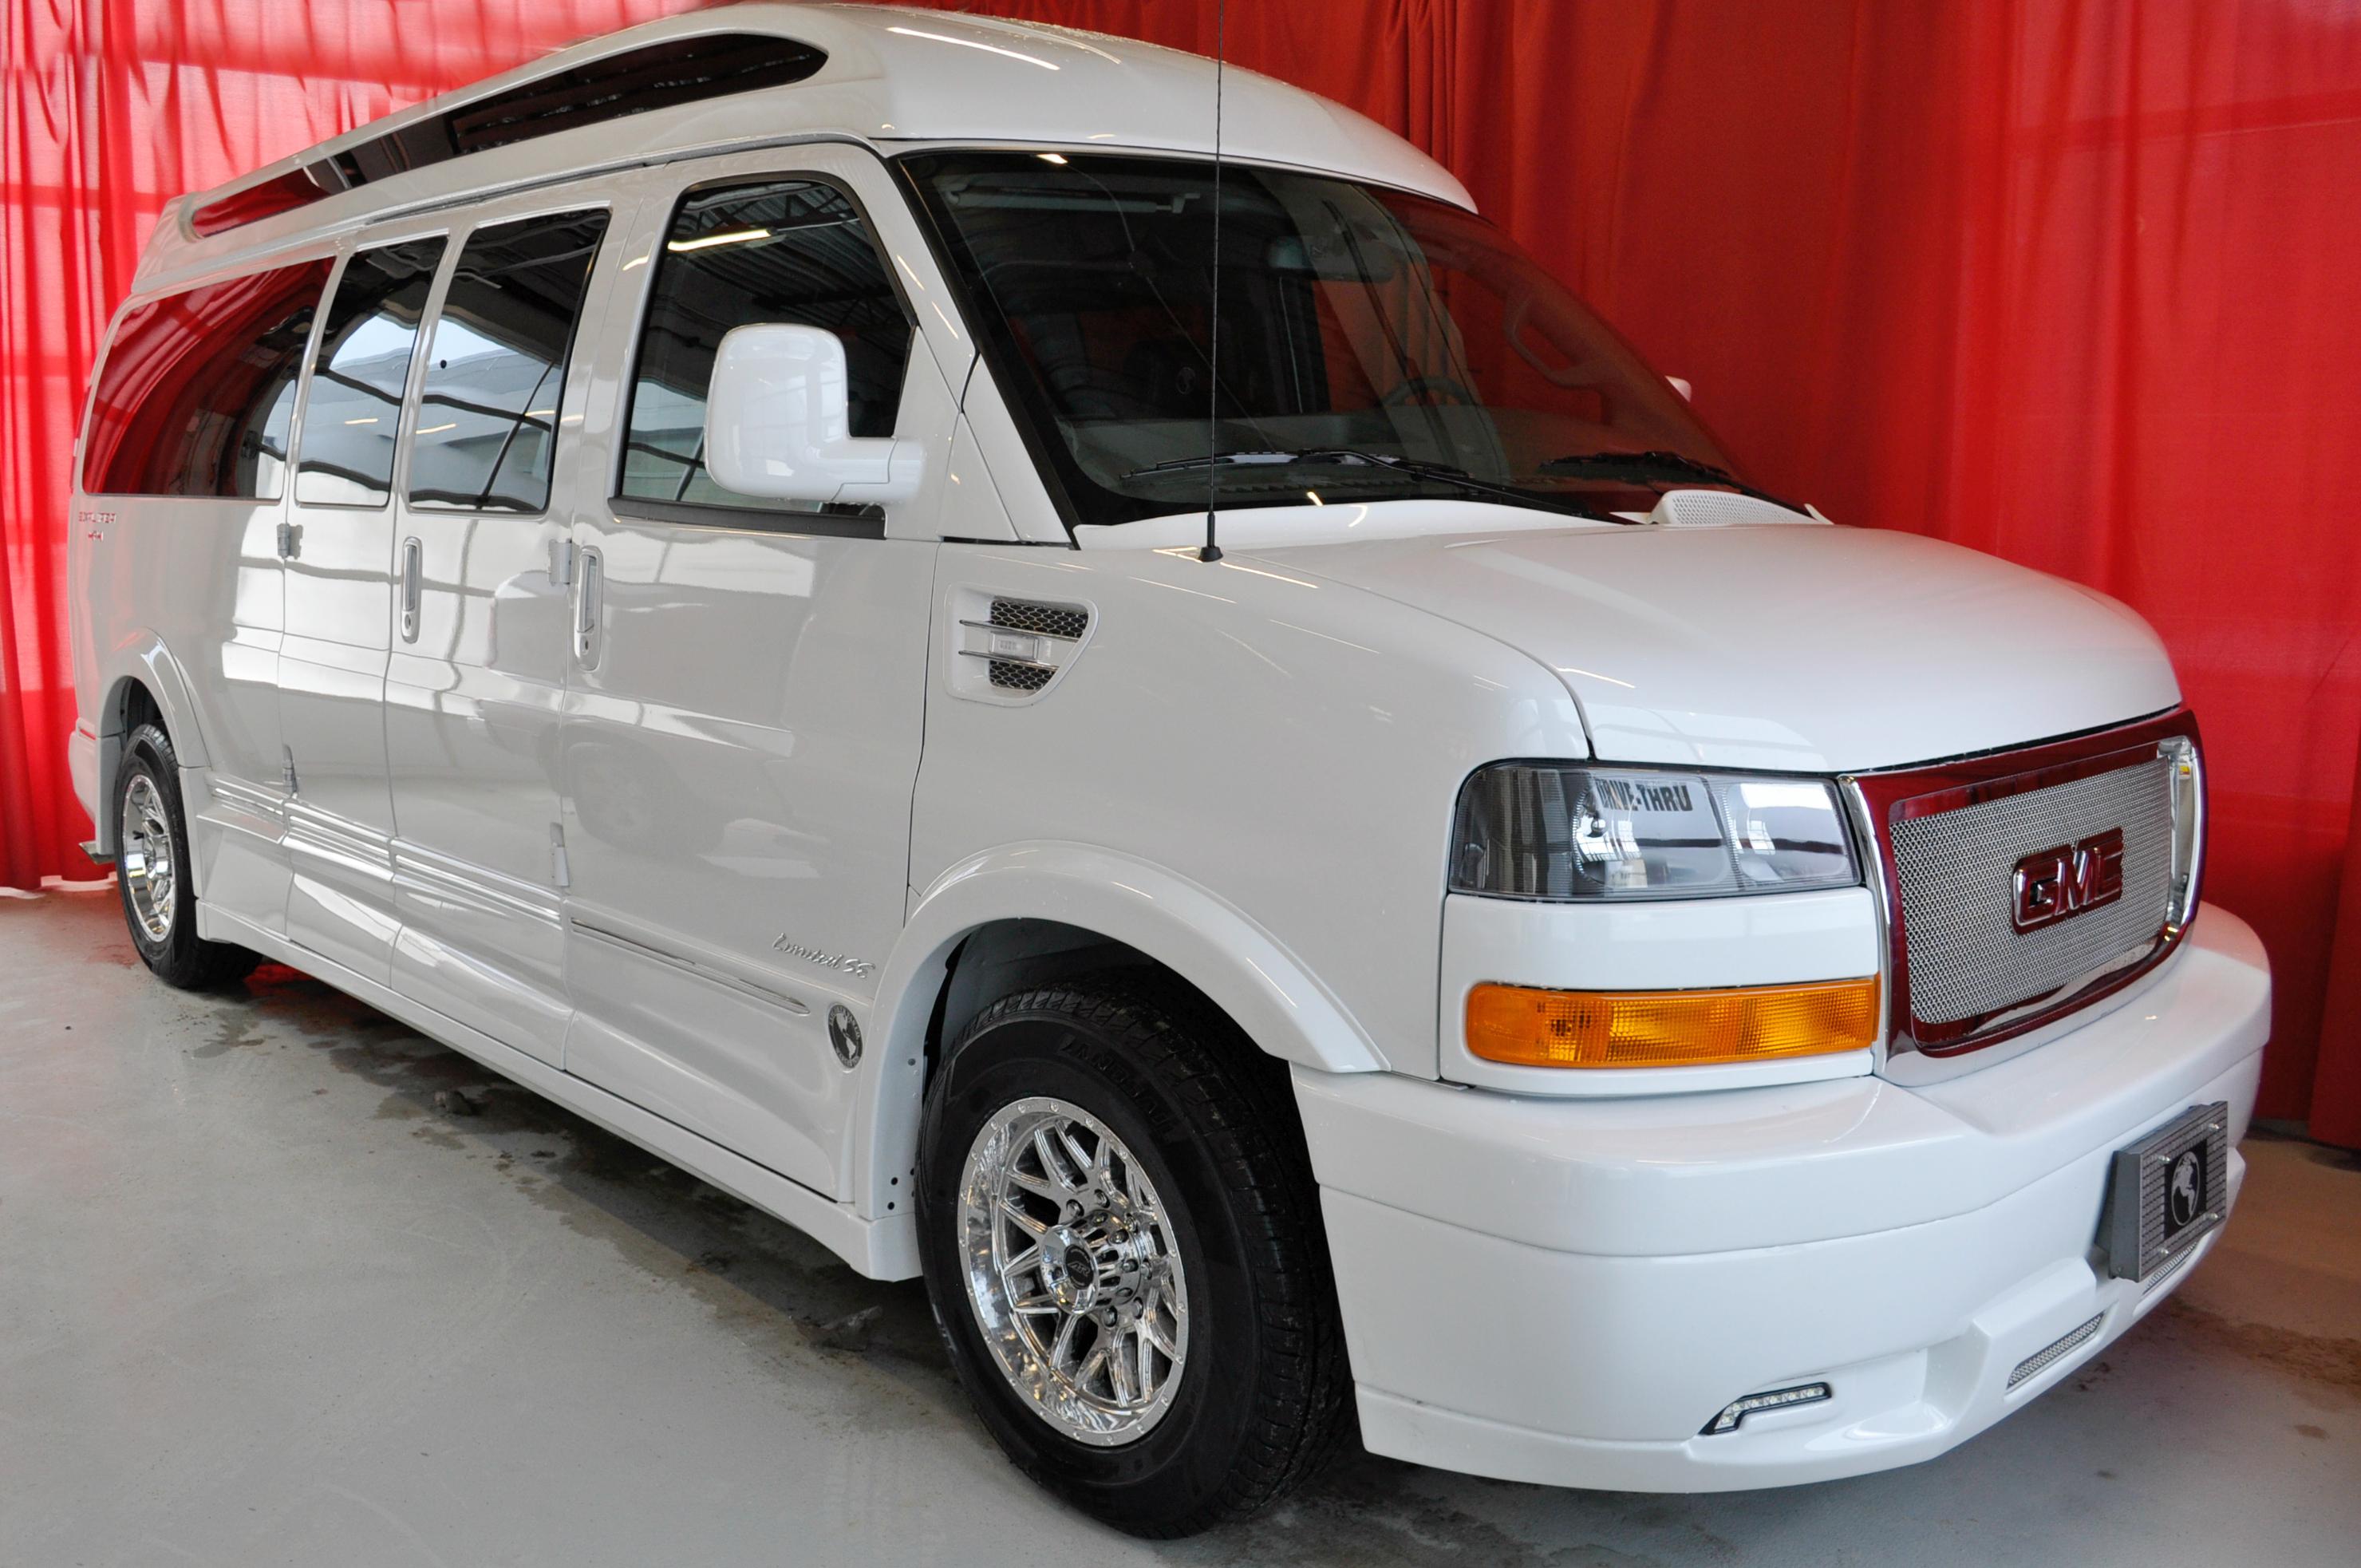 EX18-002 (1)